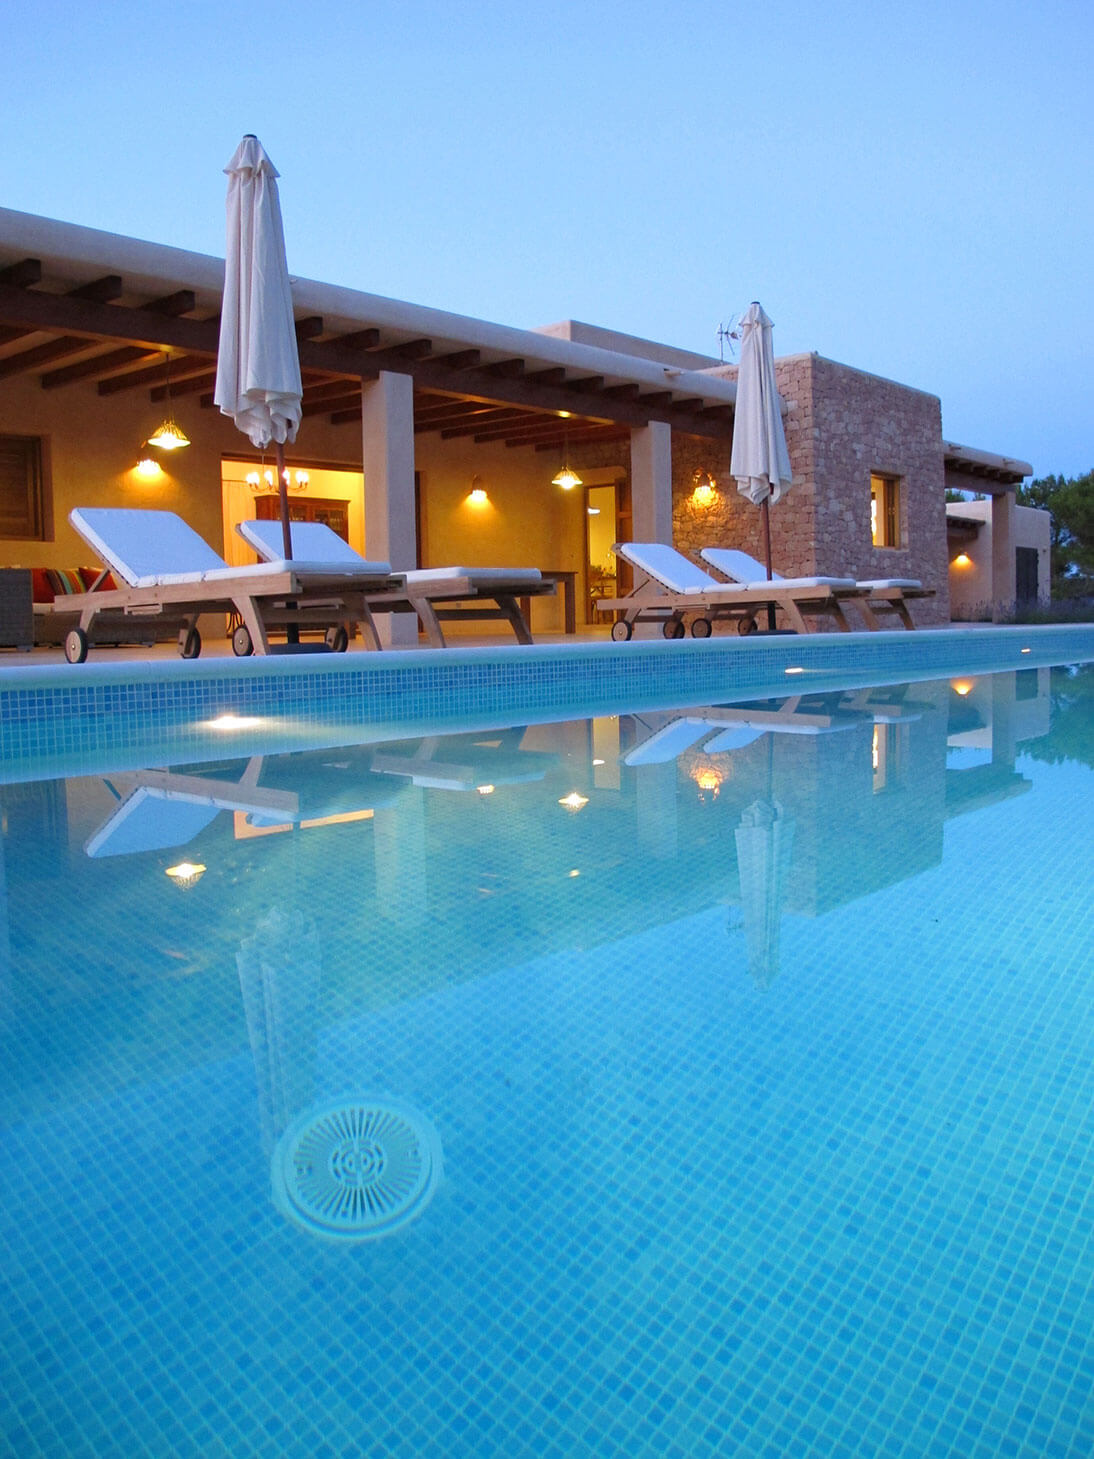 Piscina con tumbonas, villa Can Cardona en Formentera. Alojamientos turísticos Cardona